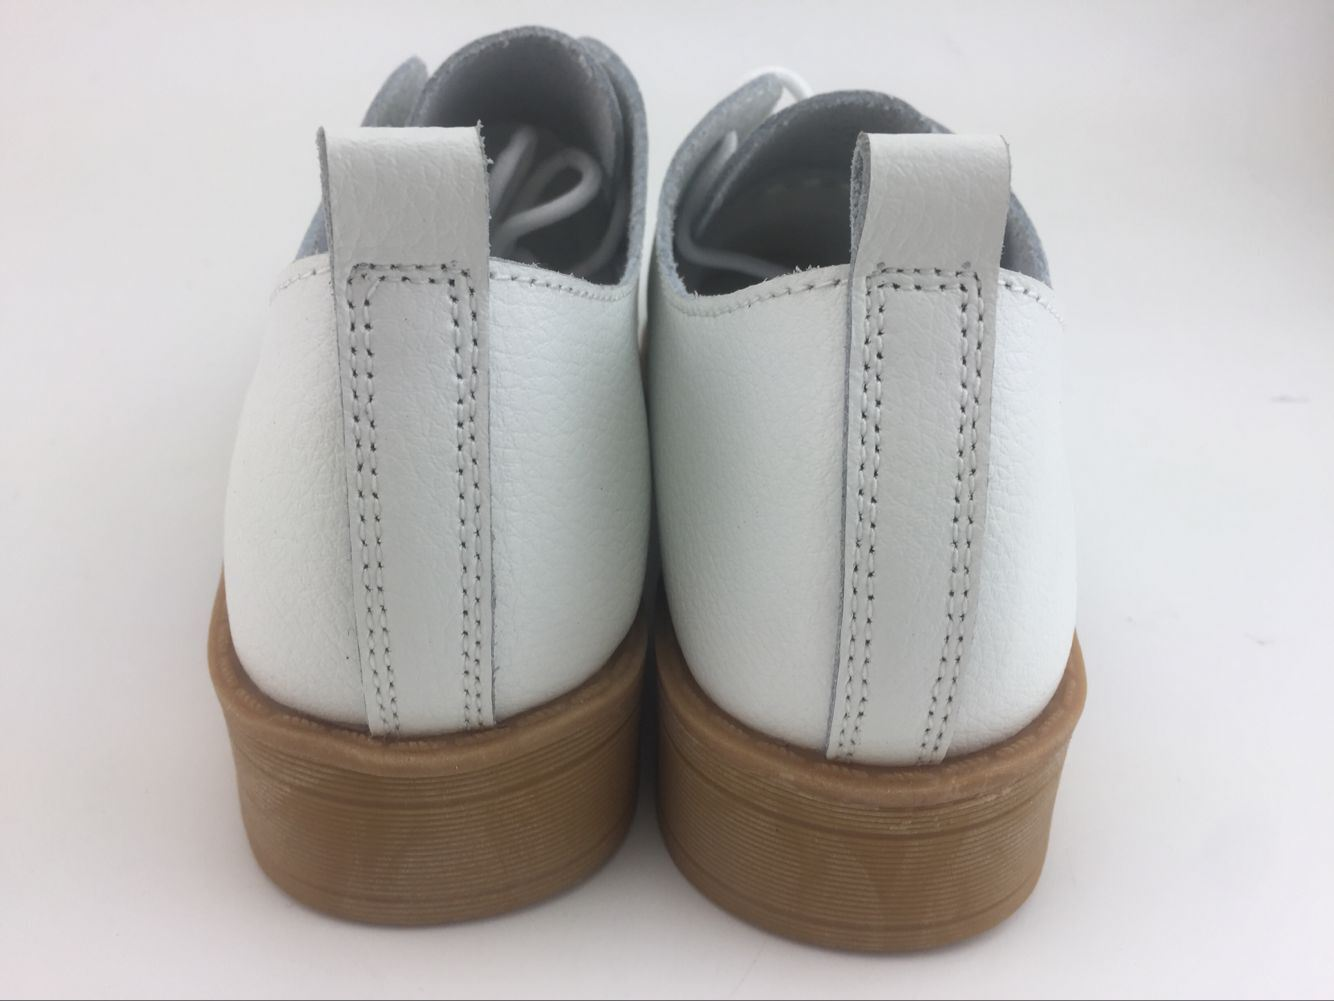 New Style Fashion Lady Leather Shoes British Style Shoes (FW-2)